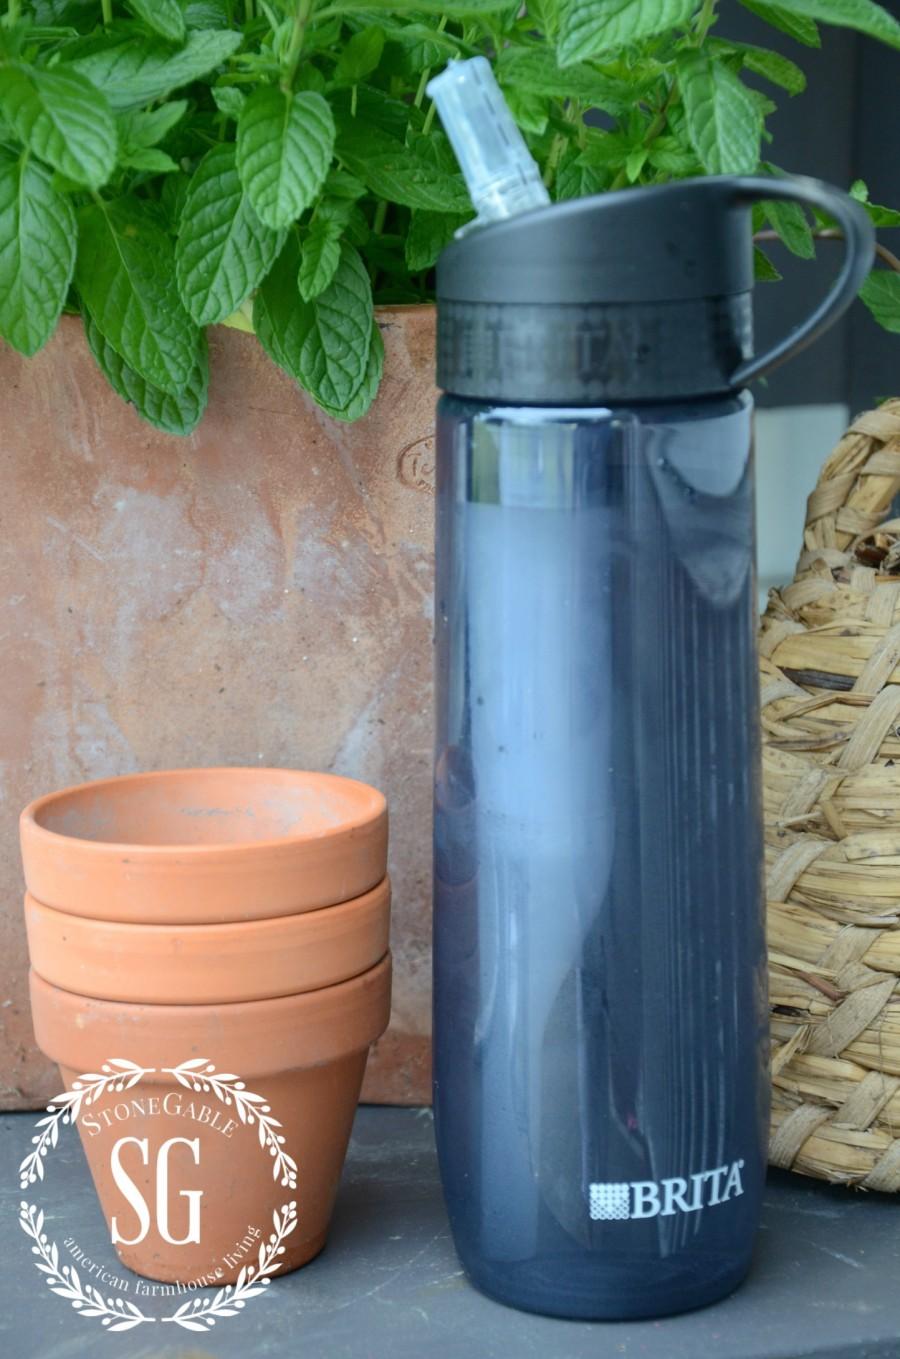 BRITA WATER BOTTLE-with filter-stonegableblog.com